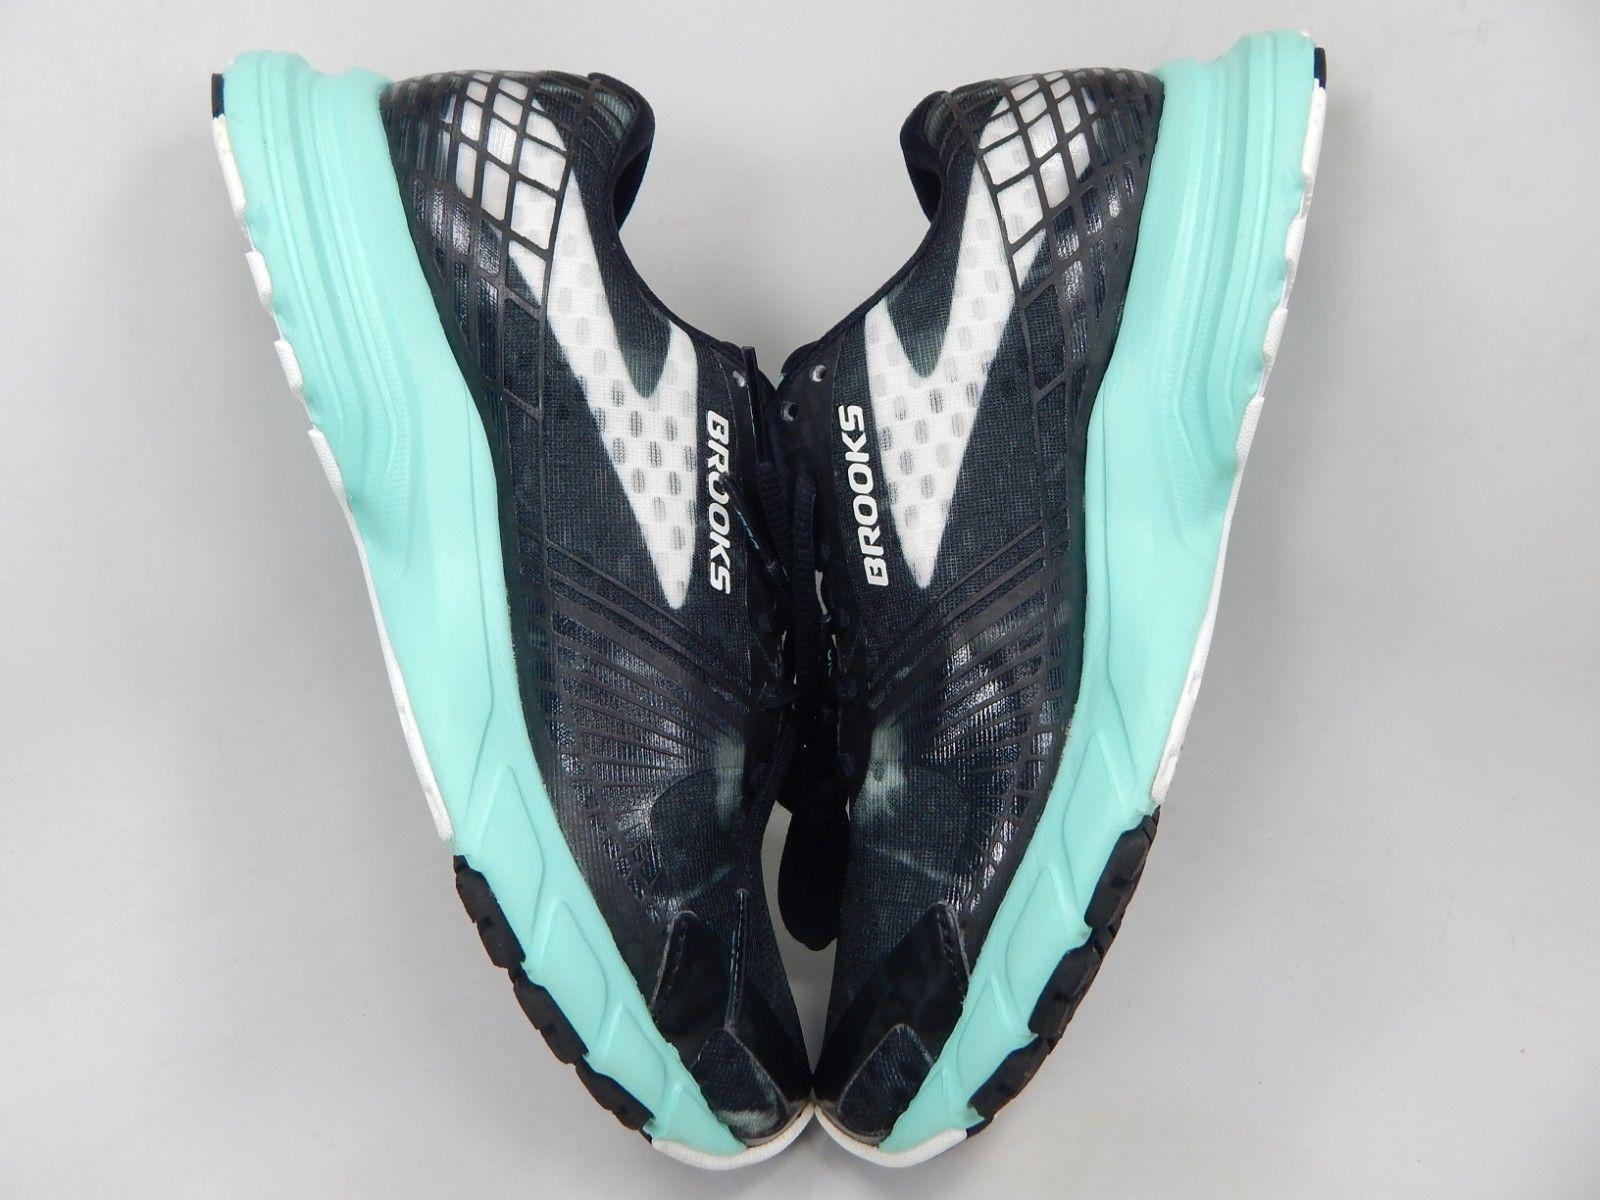 Brooks Launch 3 Size 6.5 M (B) EU 37.5 Women's Running Shoes Black 1202061B071 image 6